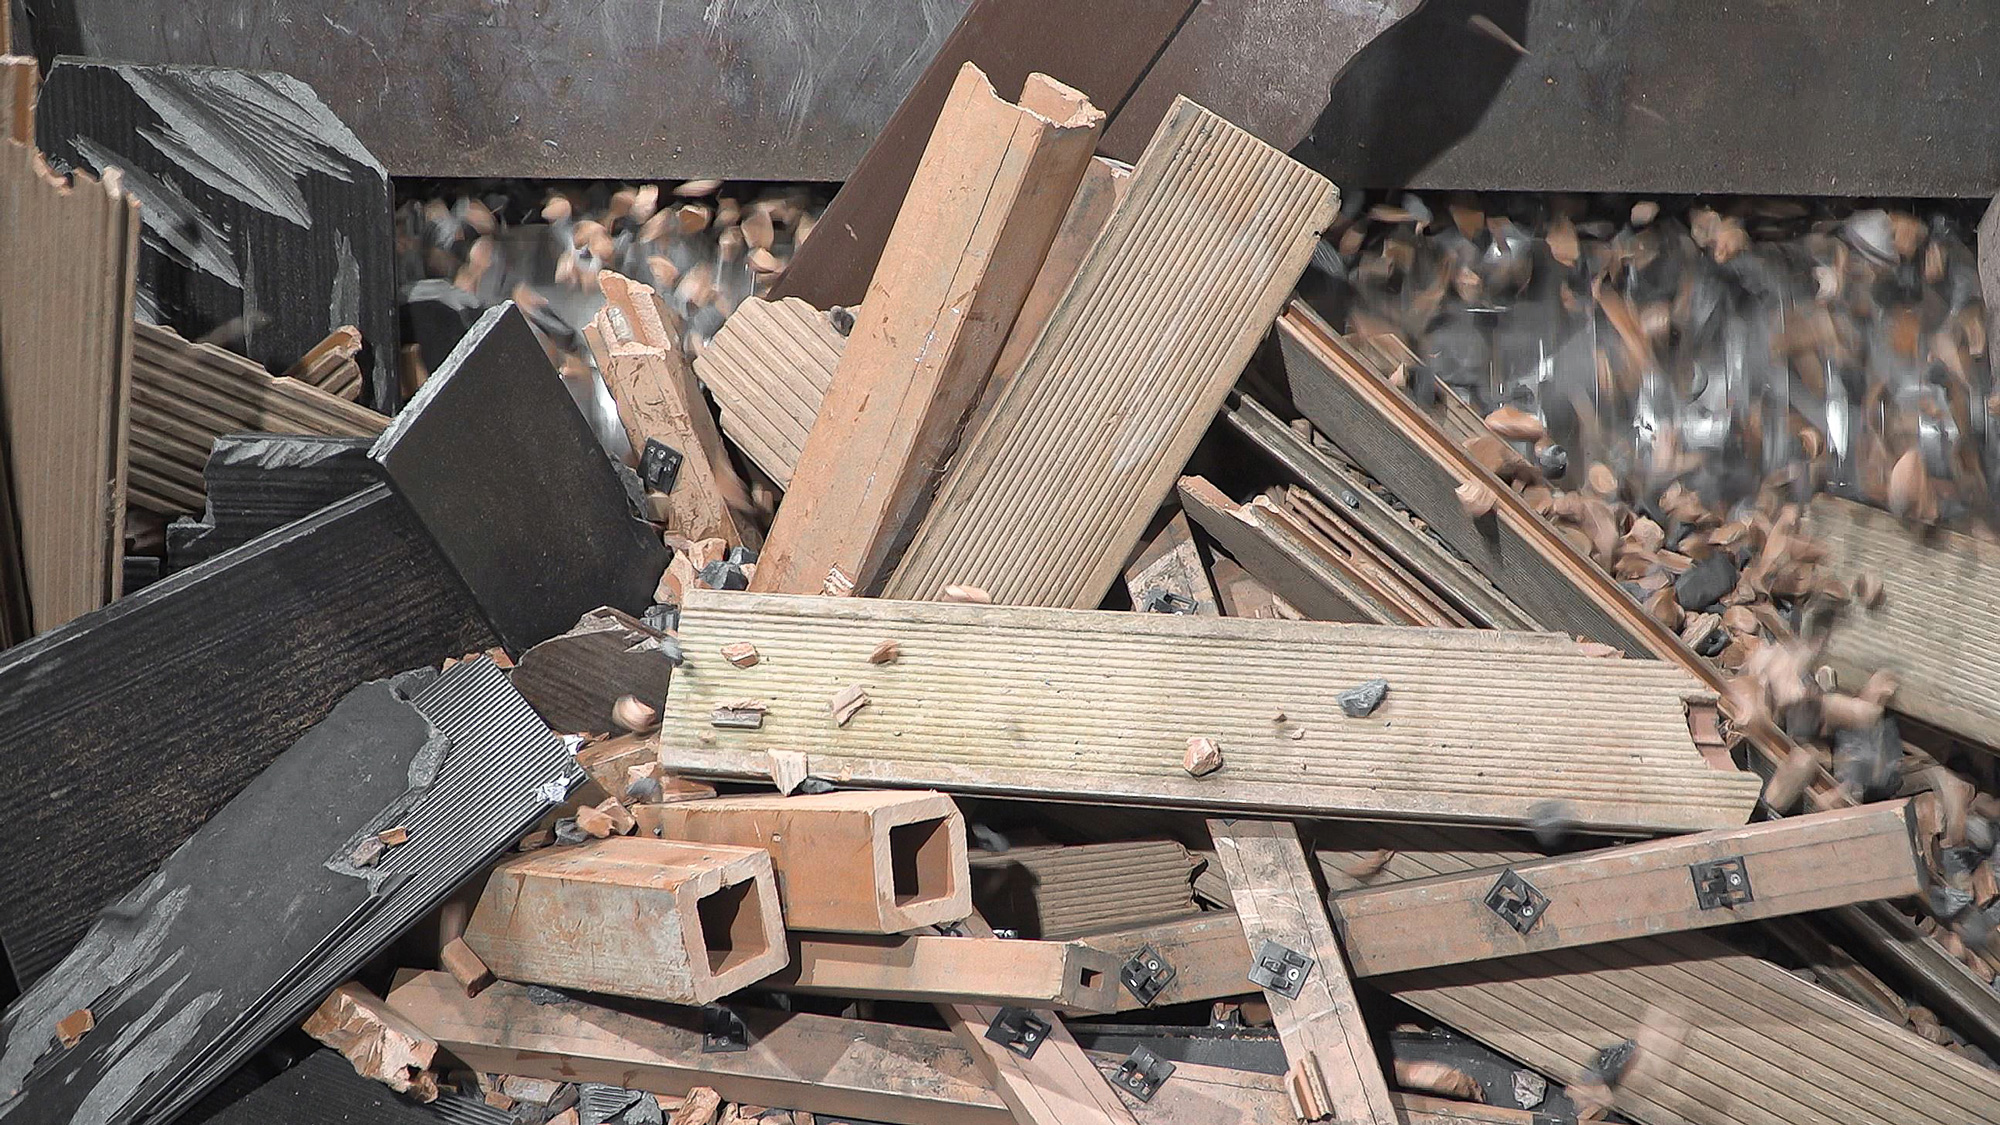 Wood composite material is shredded in WEIMA shredder